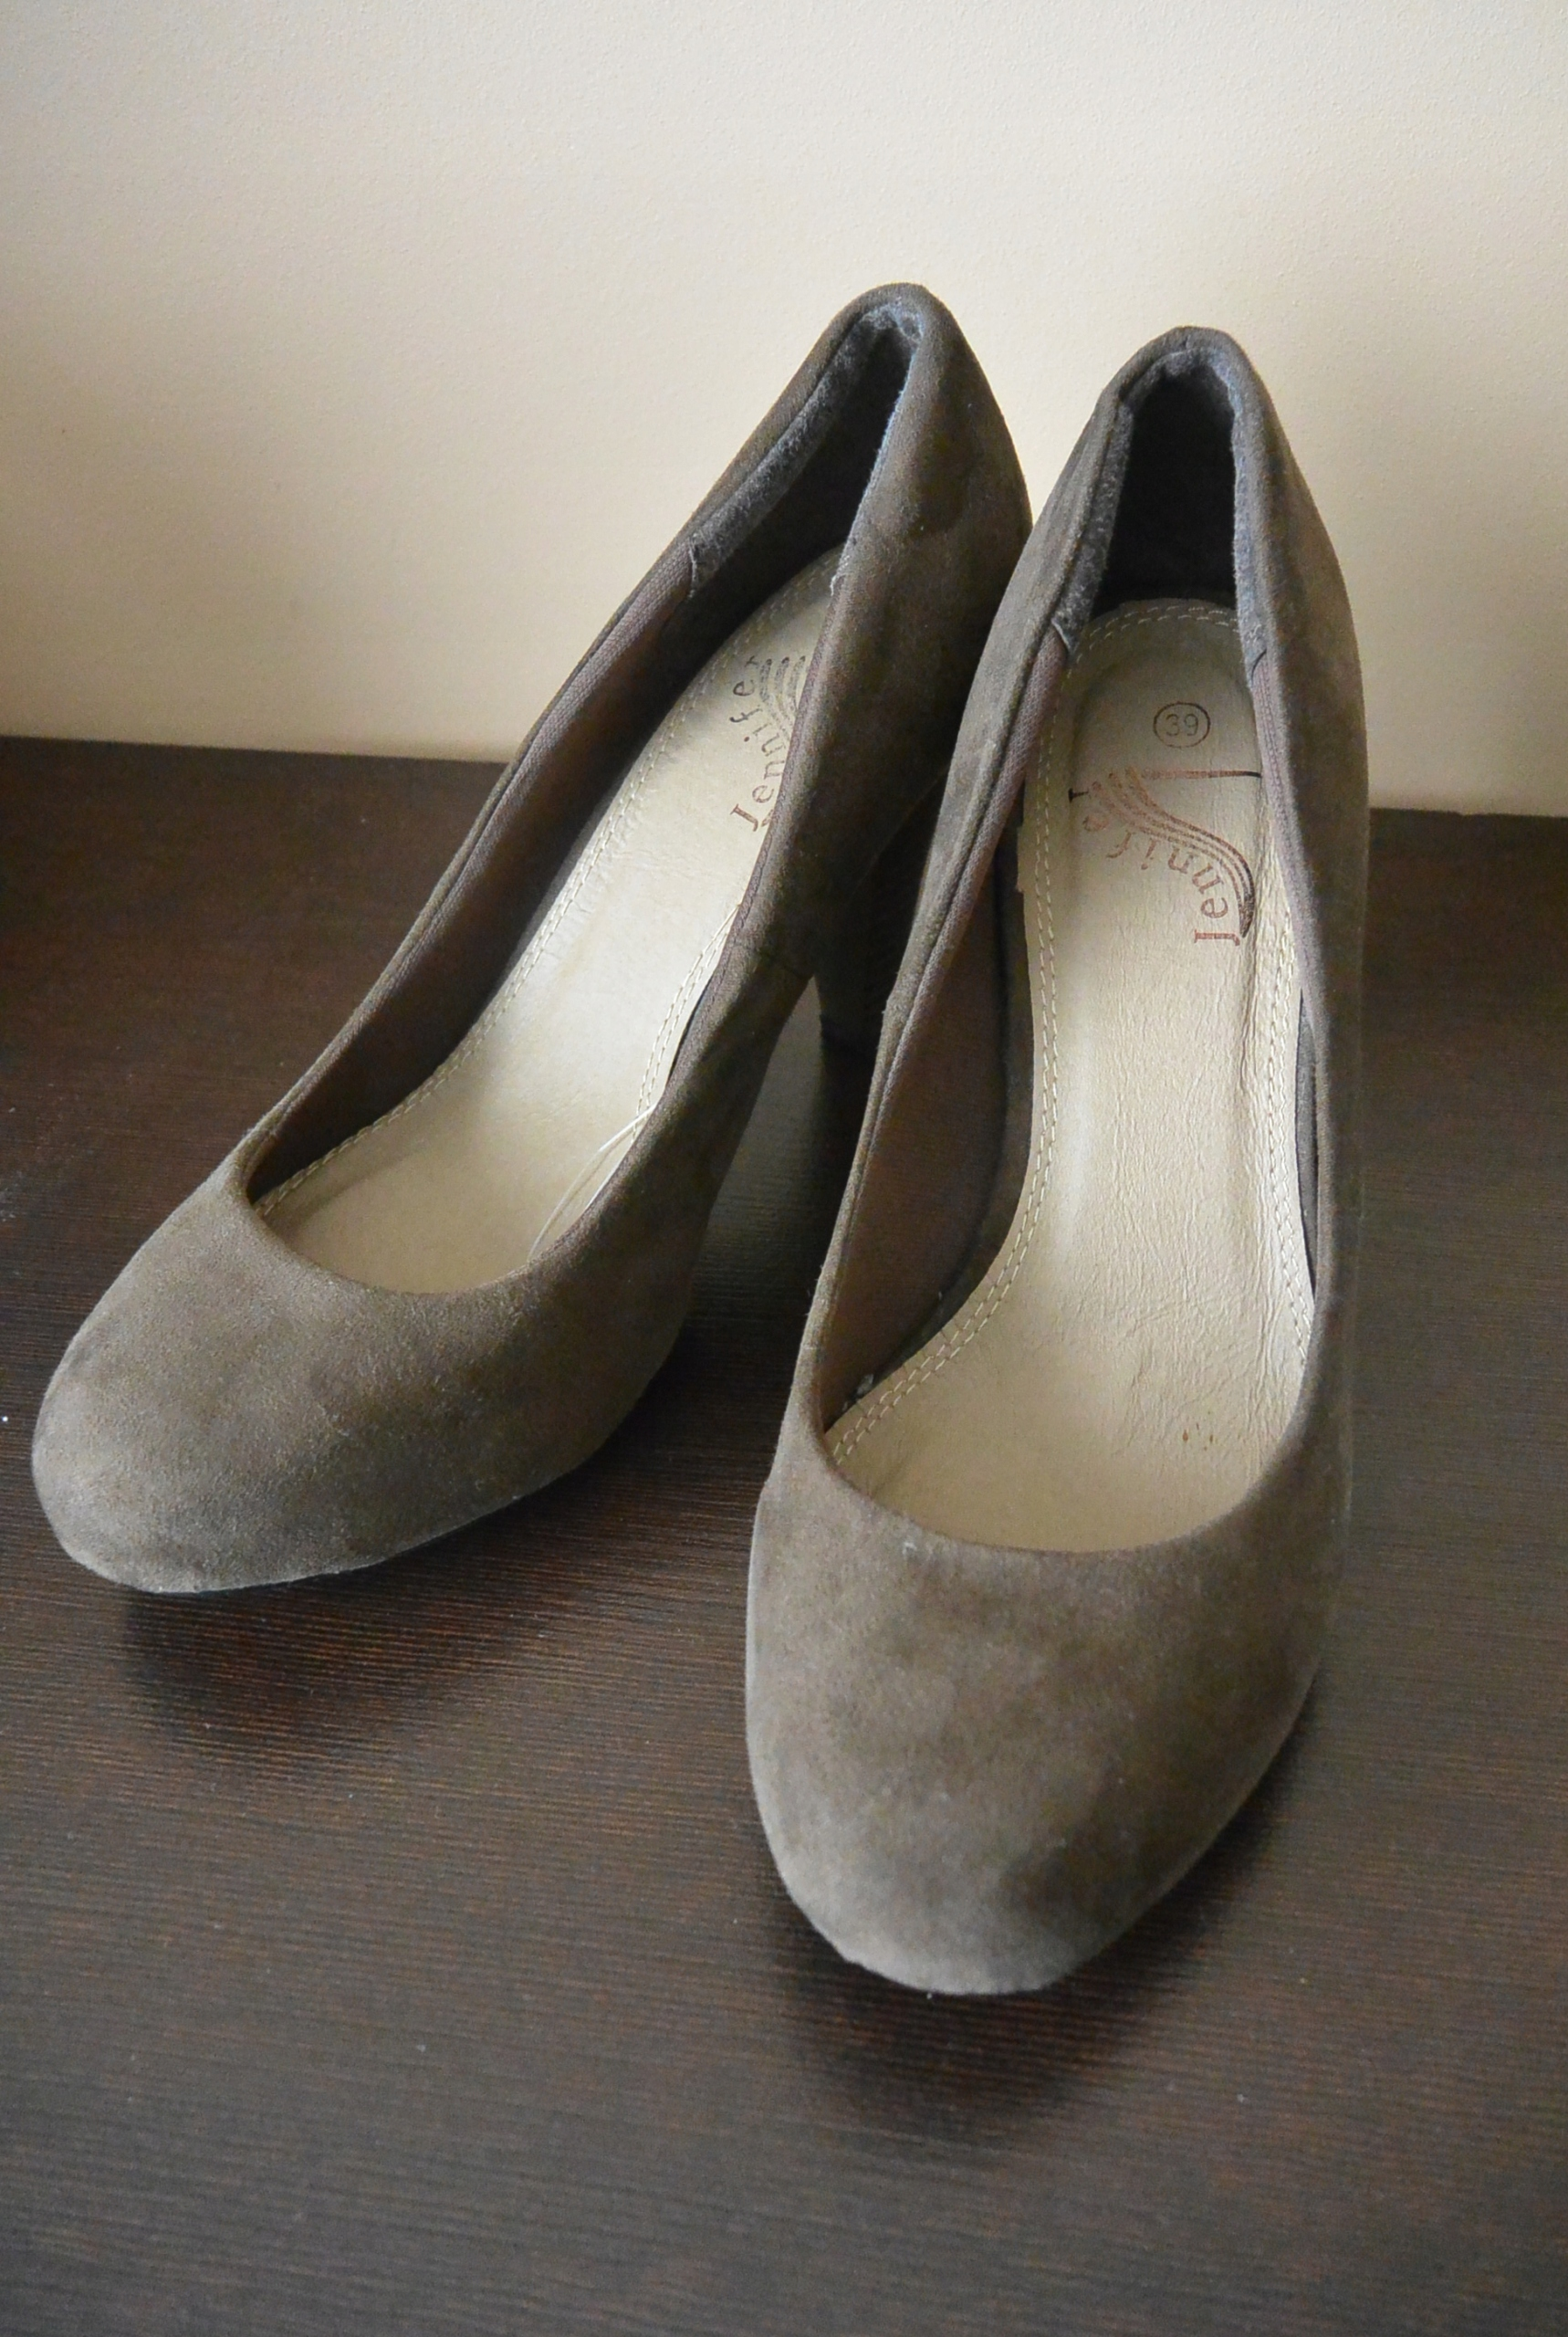 1aca18ae buty na obcasie czółenka 39 ccc - 7636124222 - oficjalne archiwum ...